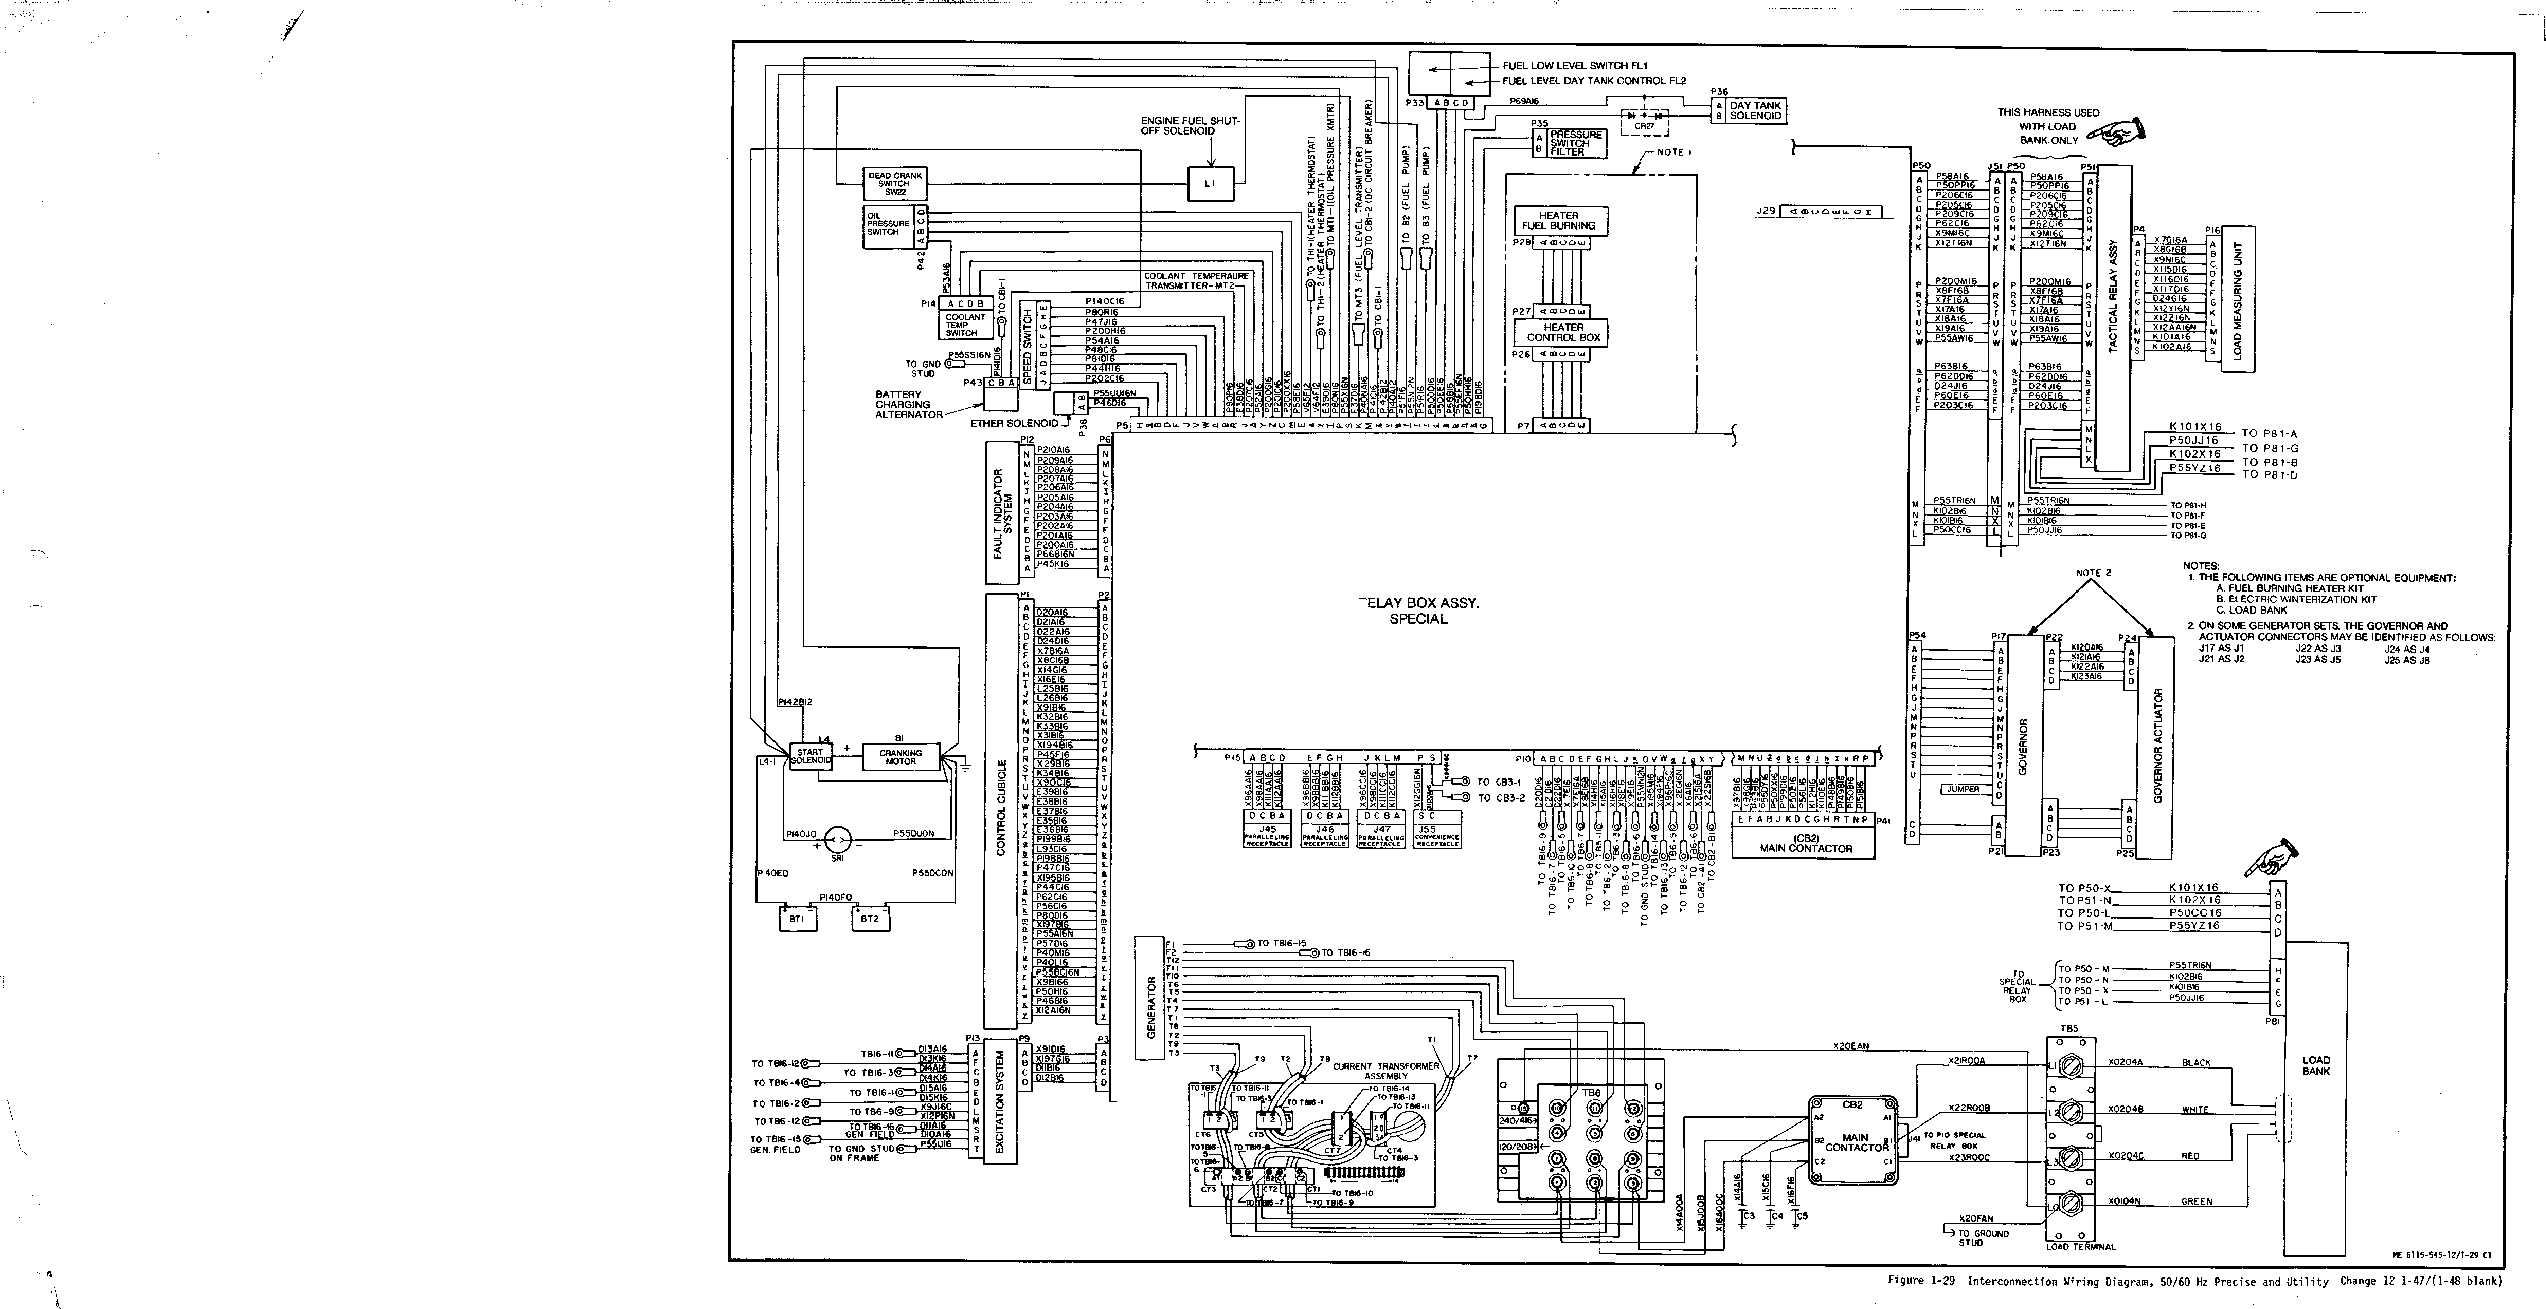 Figure 1 29 Interconnection Wiring Diagram